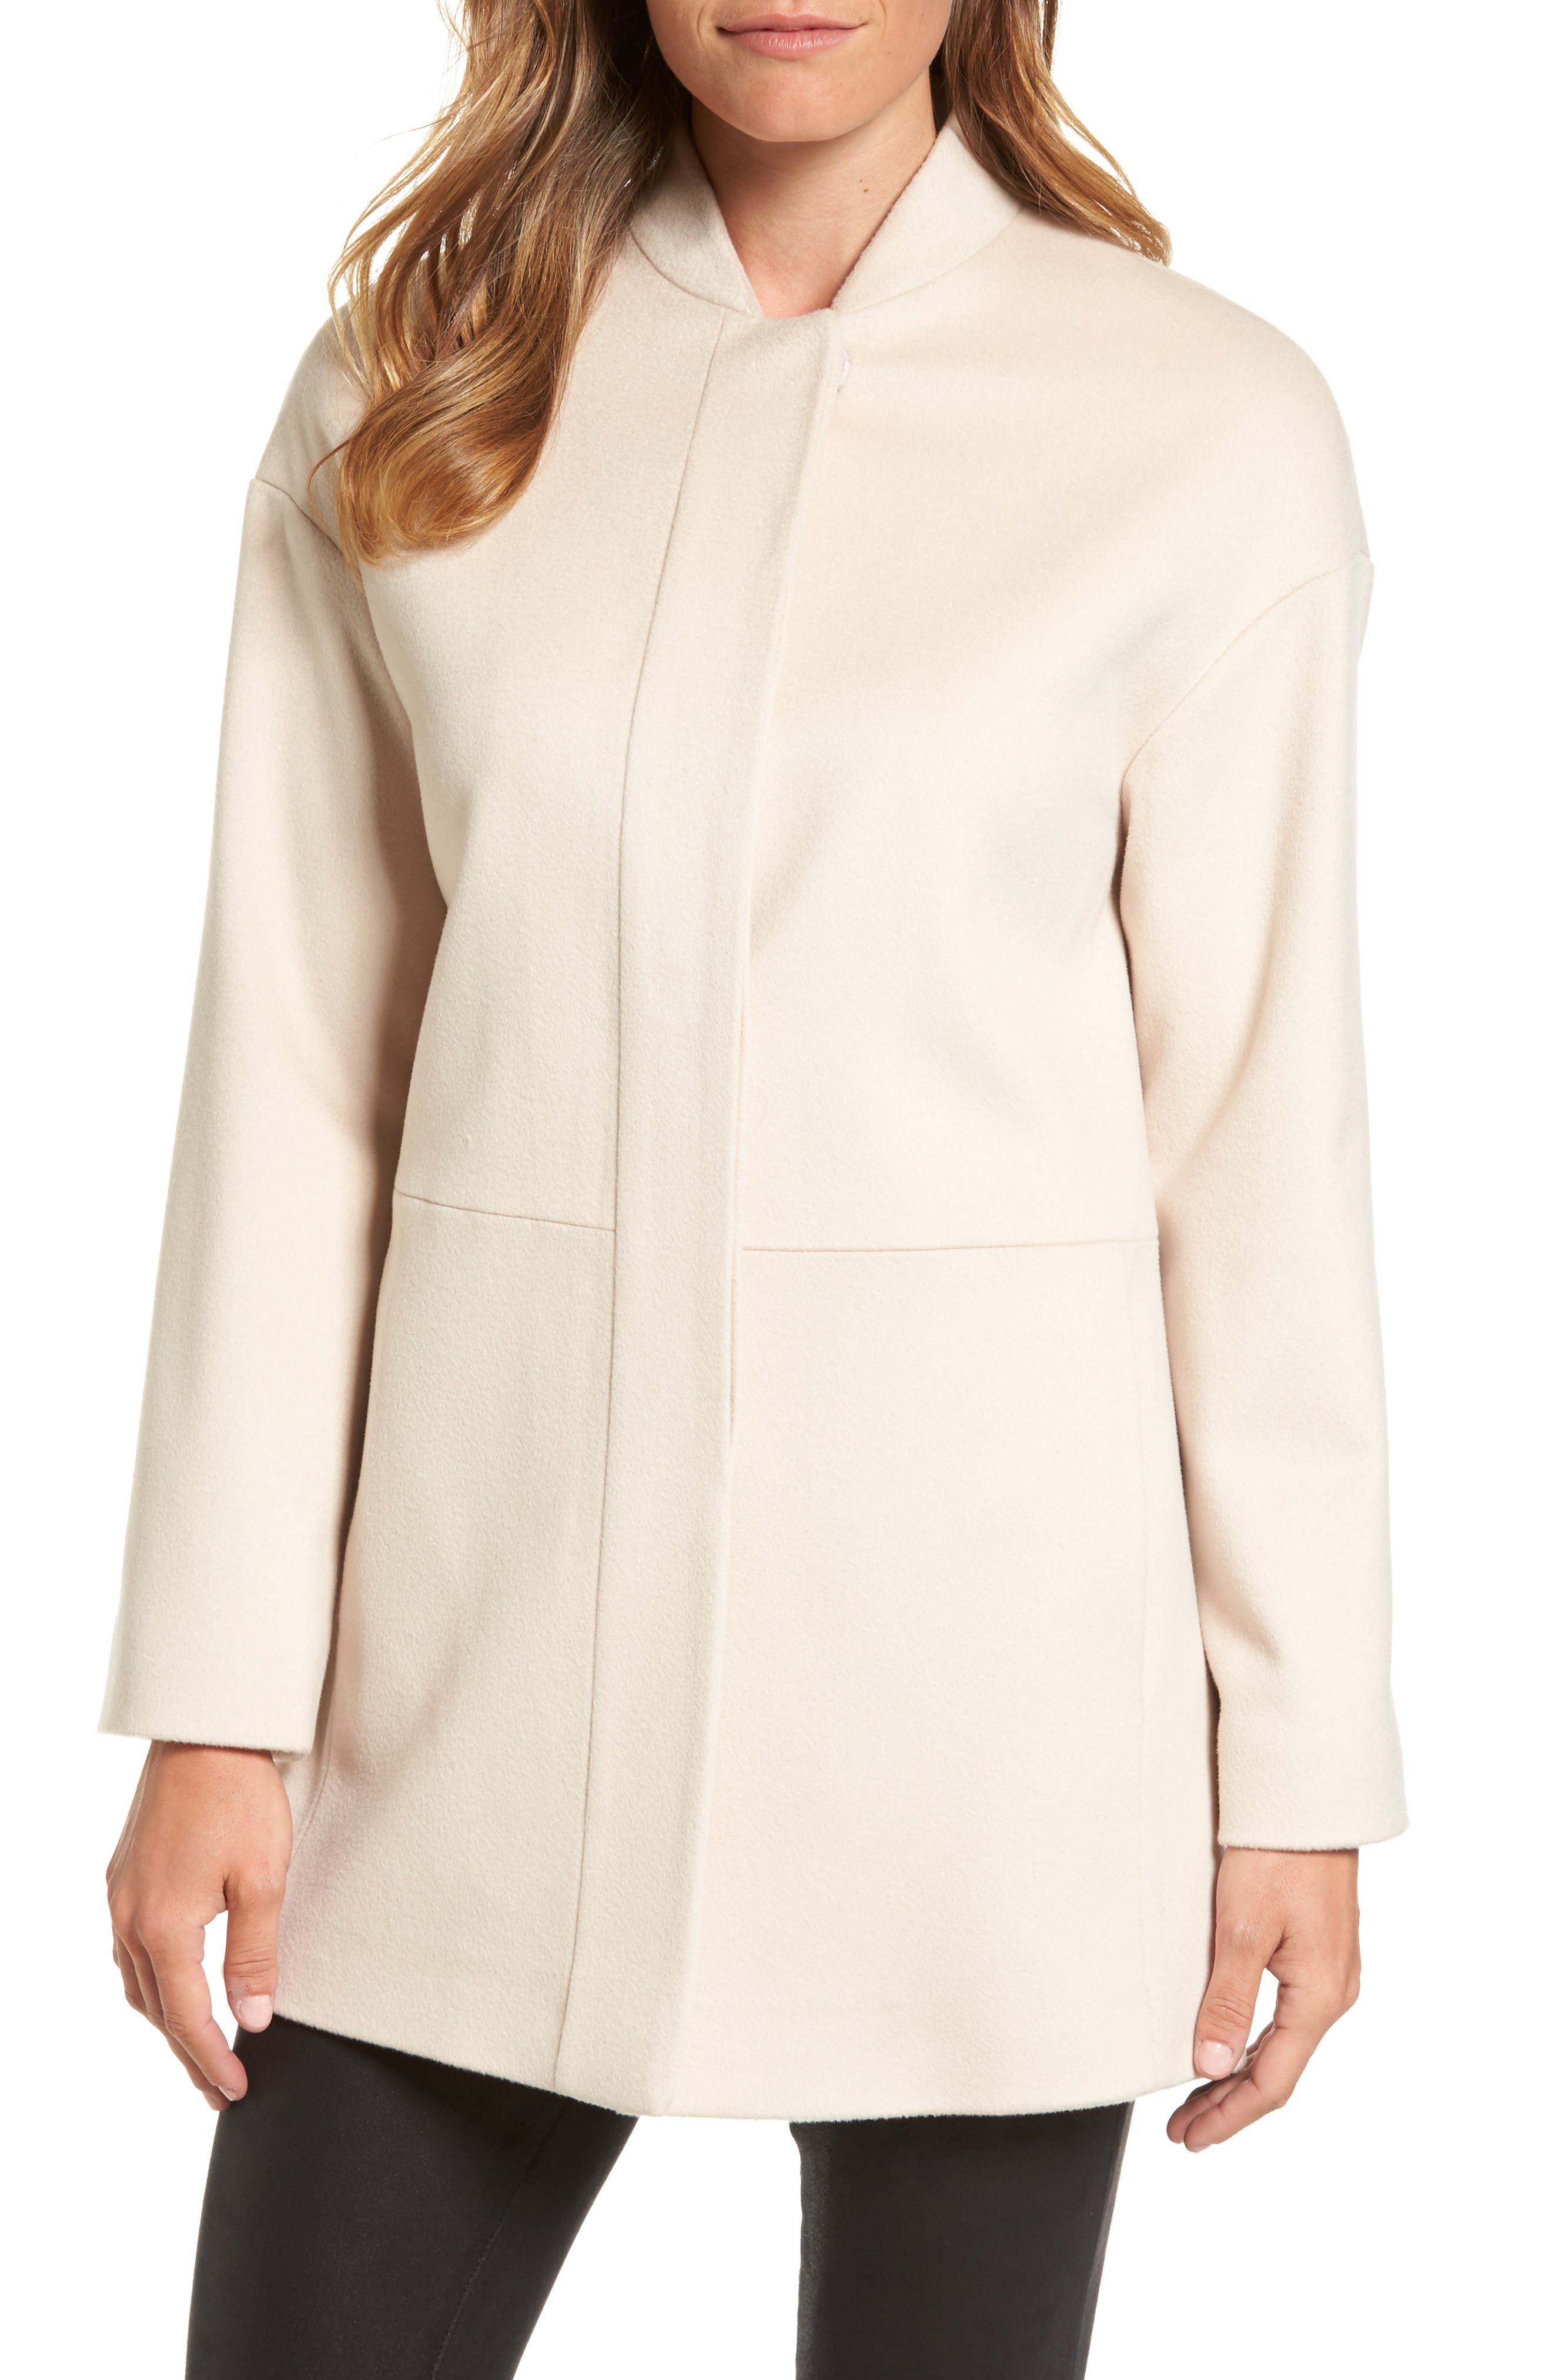 Loro Piana Wool Coat,                         Main,                         color, Blanco